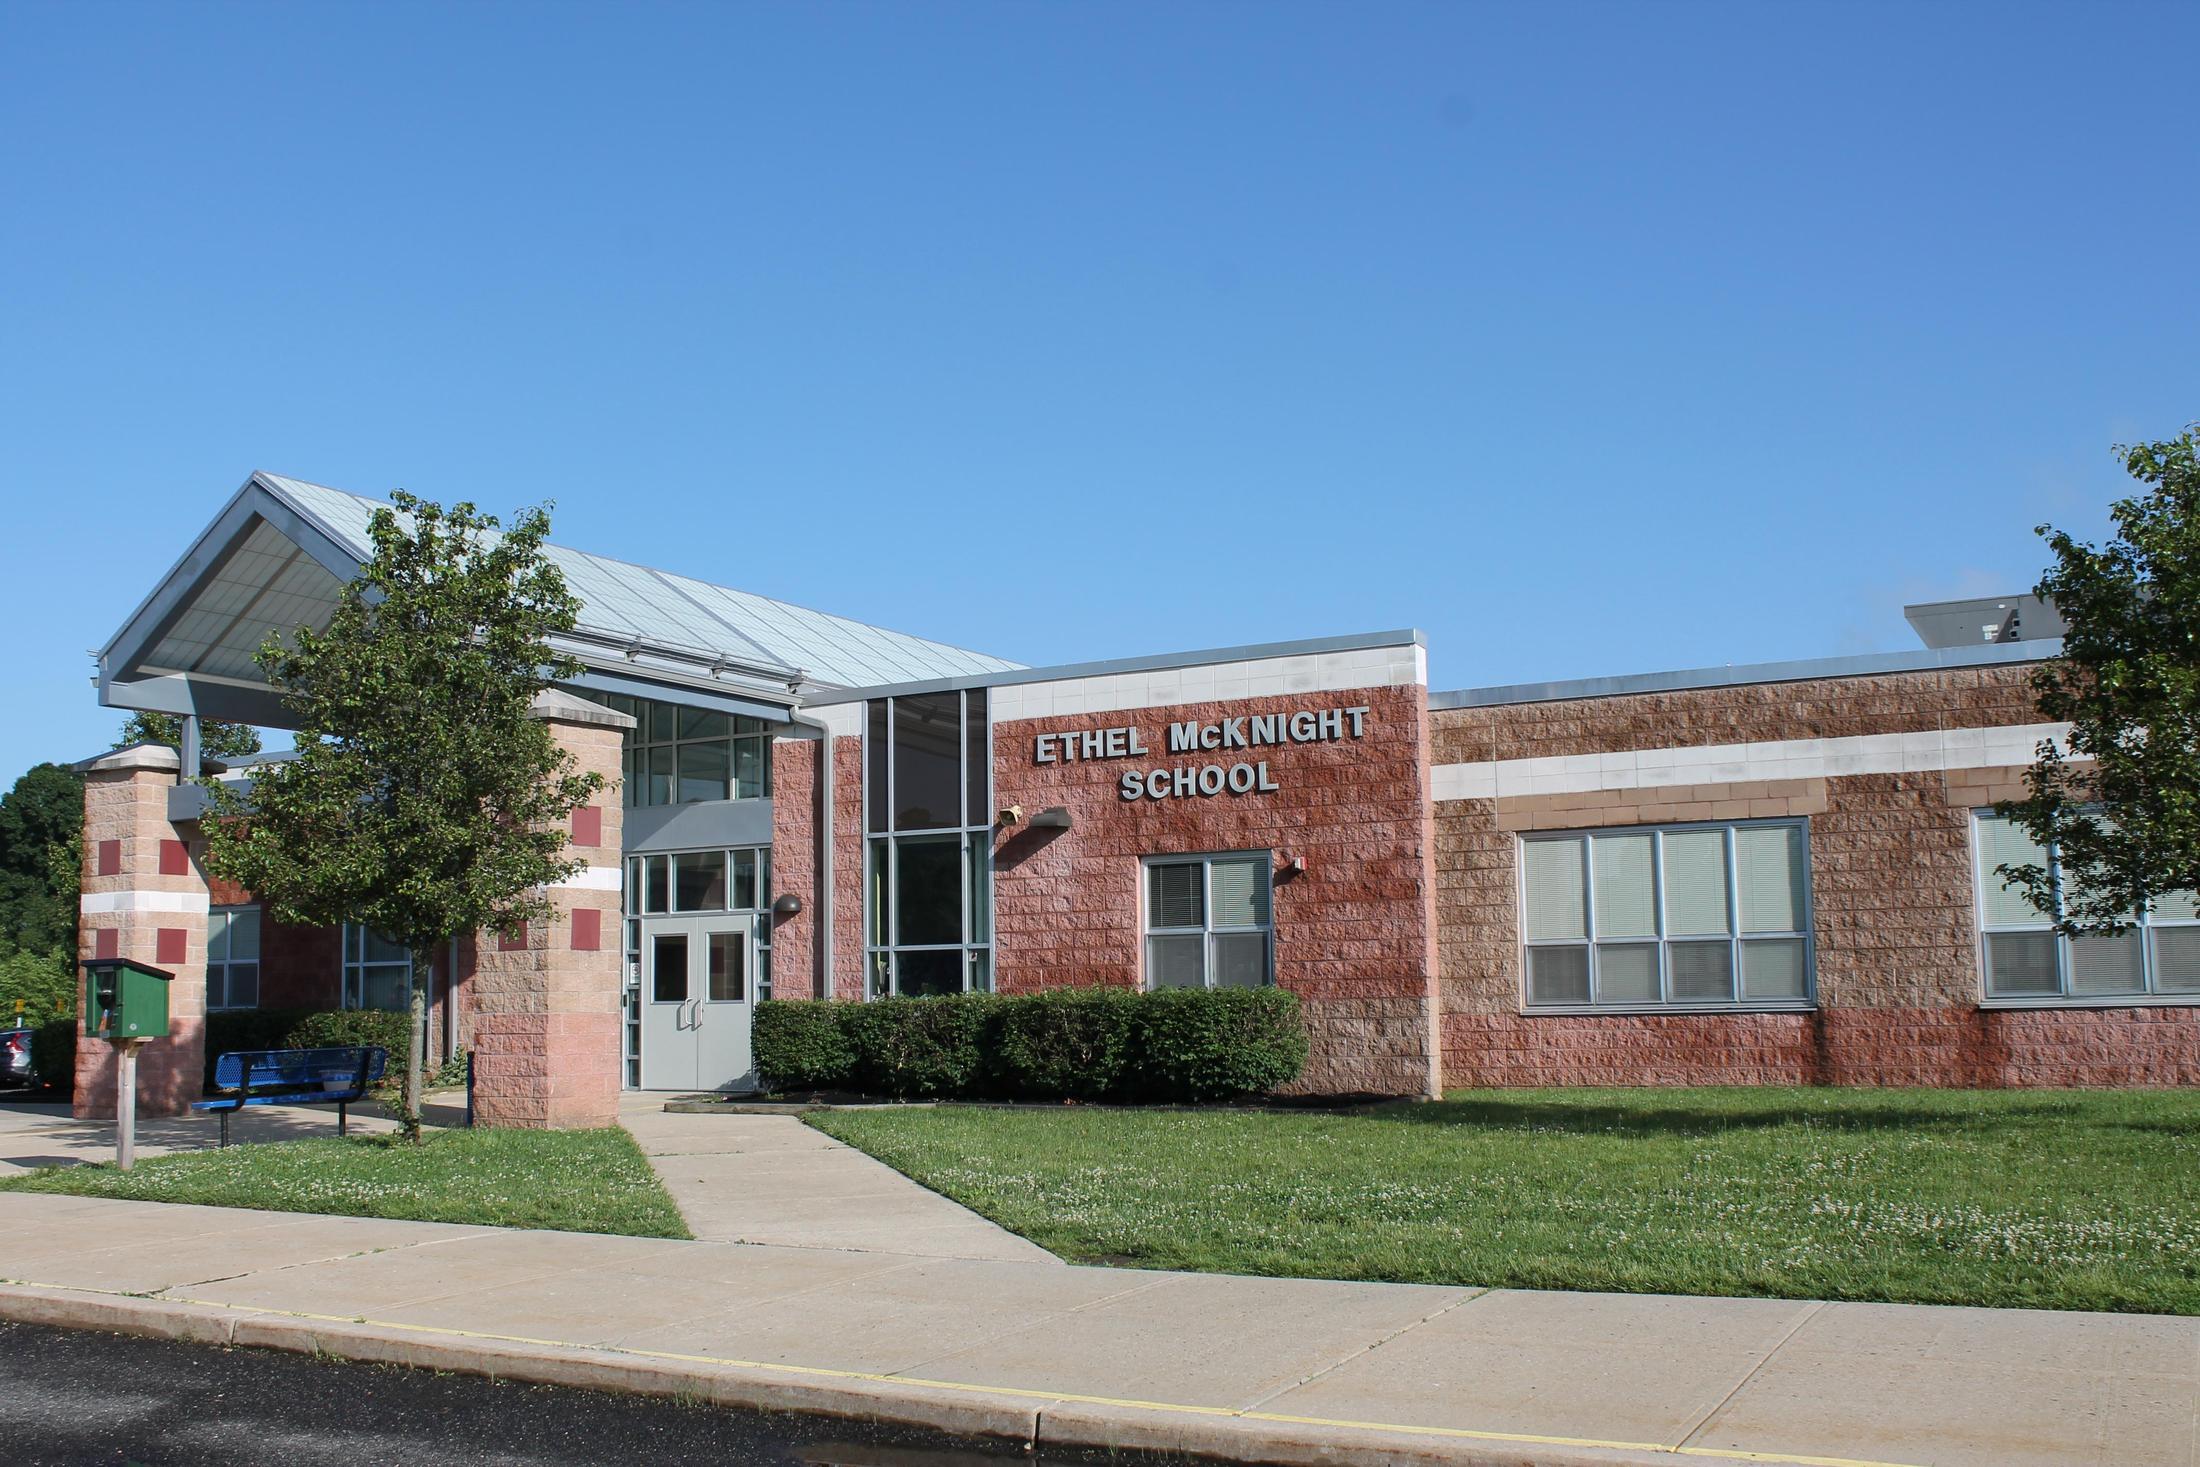 Ethel Mcknight Elementary School – Ethel Mcknight Elementary Inside East Windsor Regional School Calendar